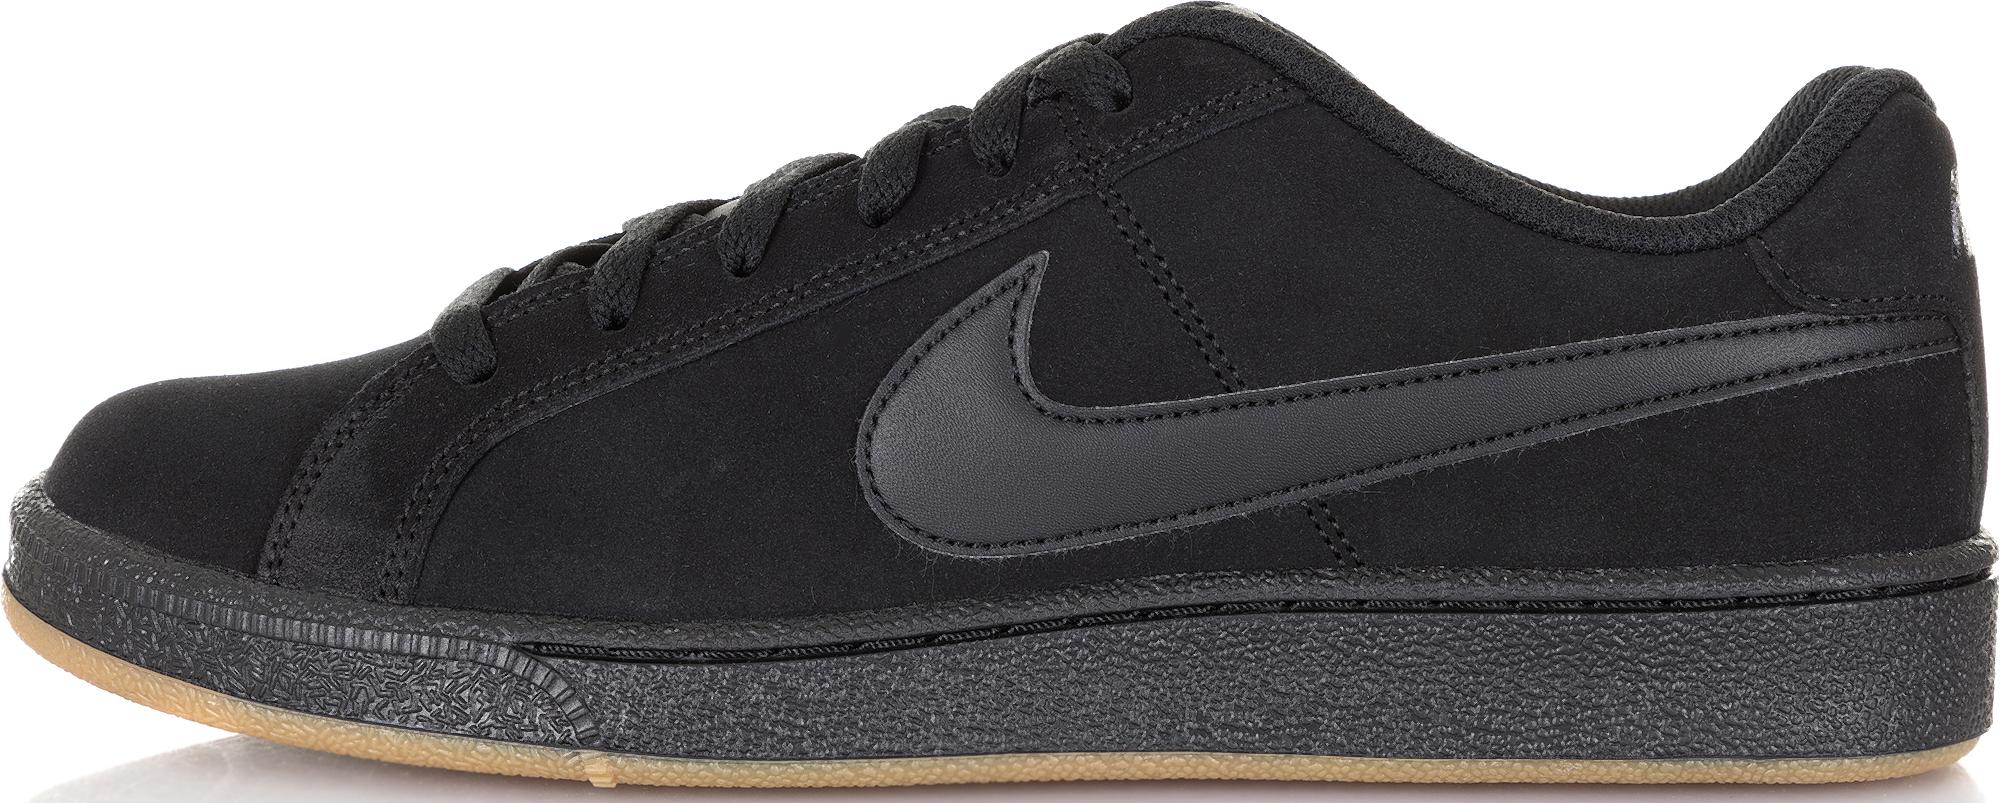 Nike Кеды мужские Nike Court Royale, размер 45 кроссовки для тенниса мужские nike court lite цвет белый 845021 100 размер 10 5 43 5